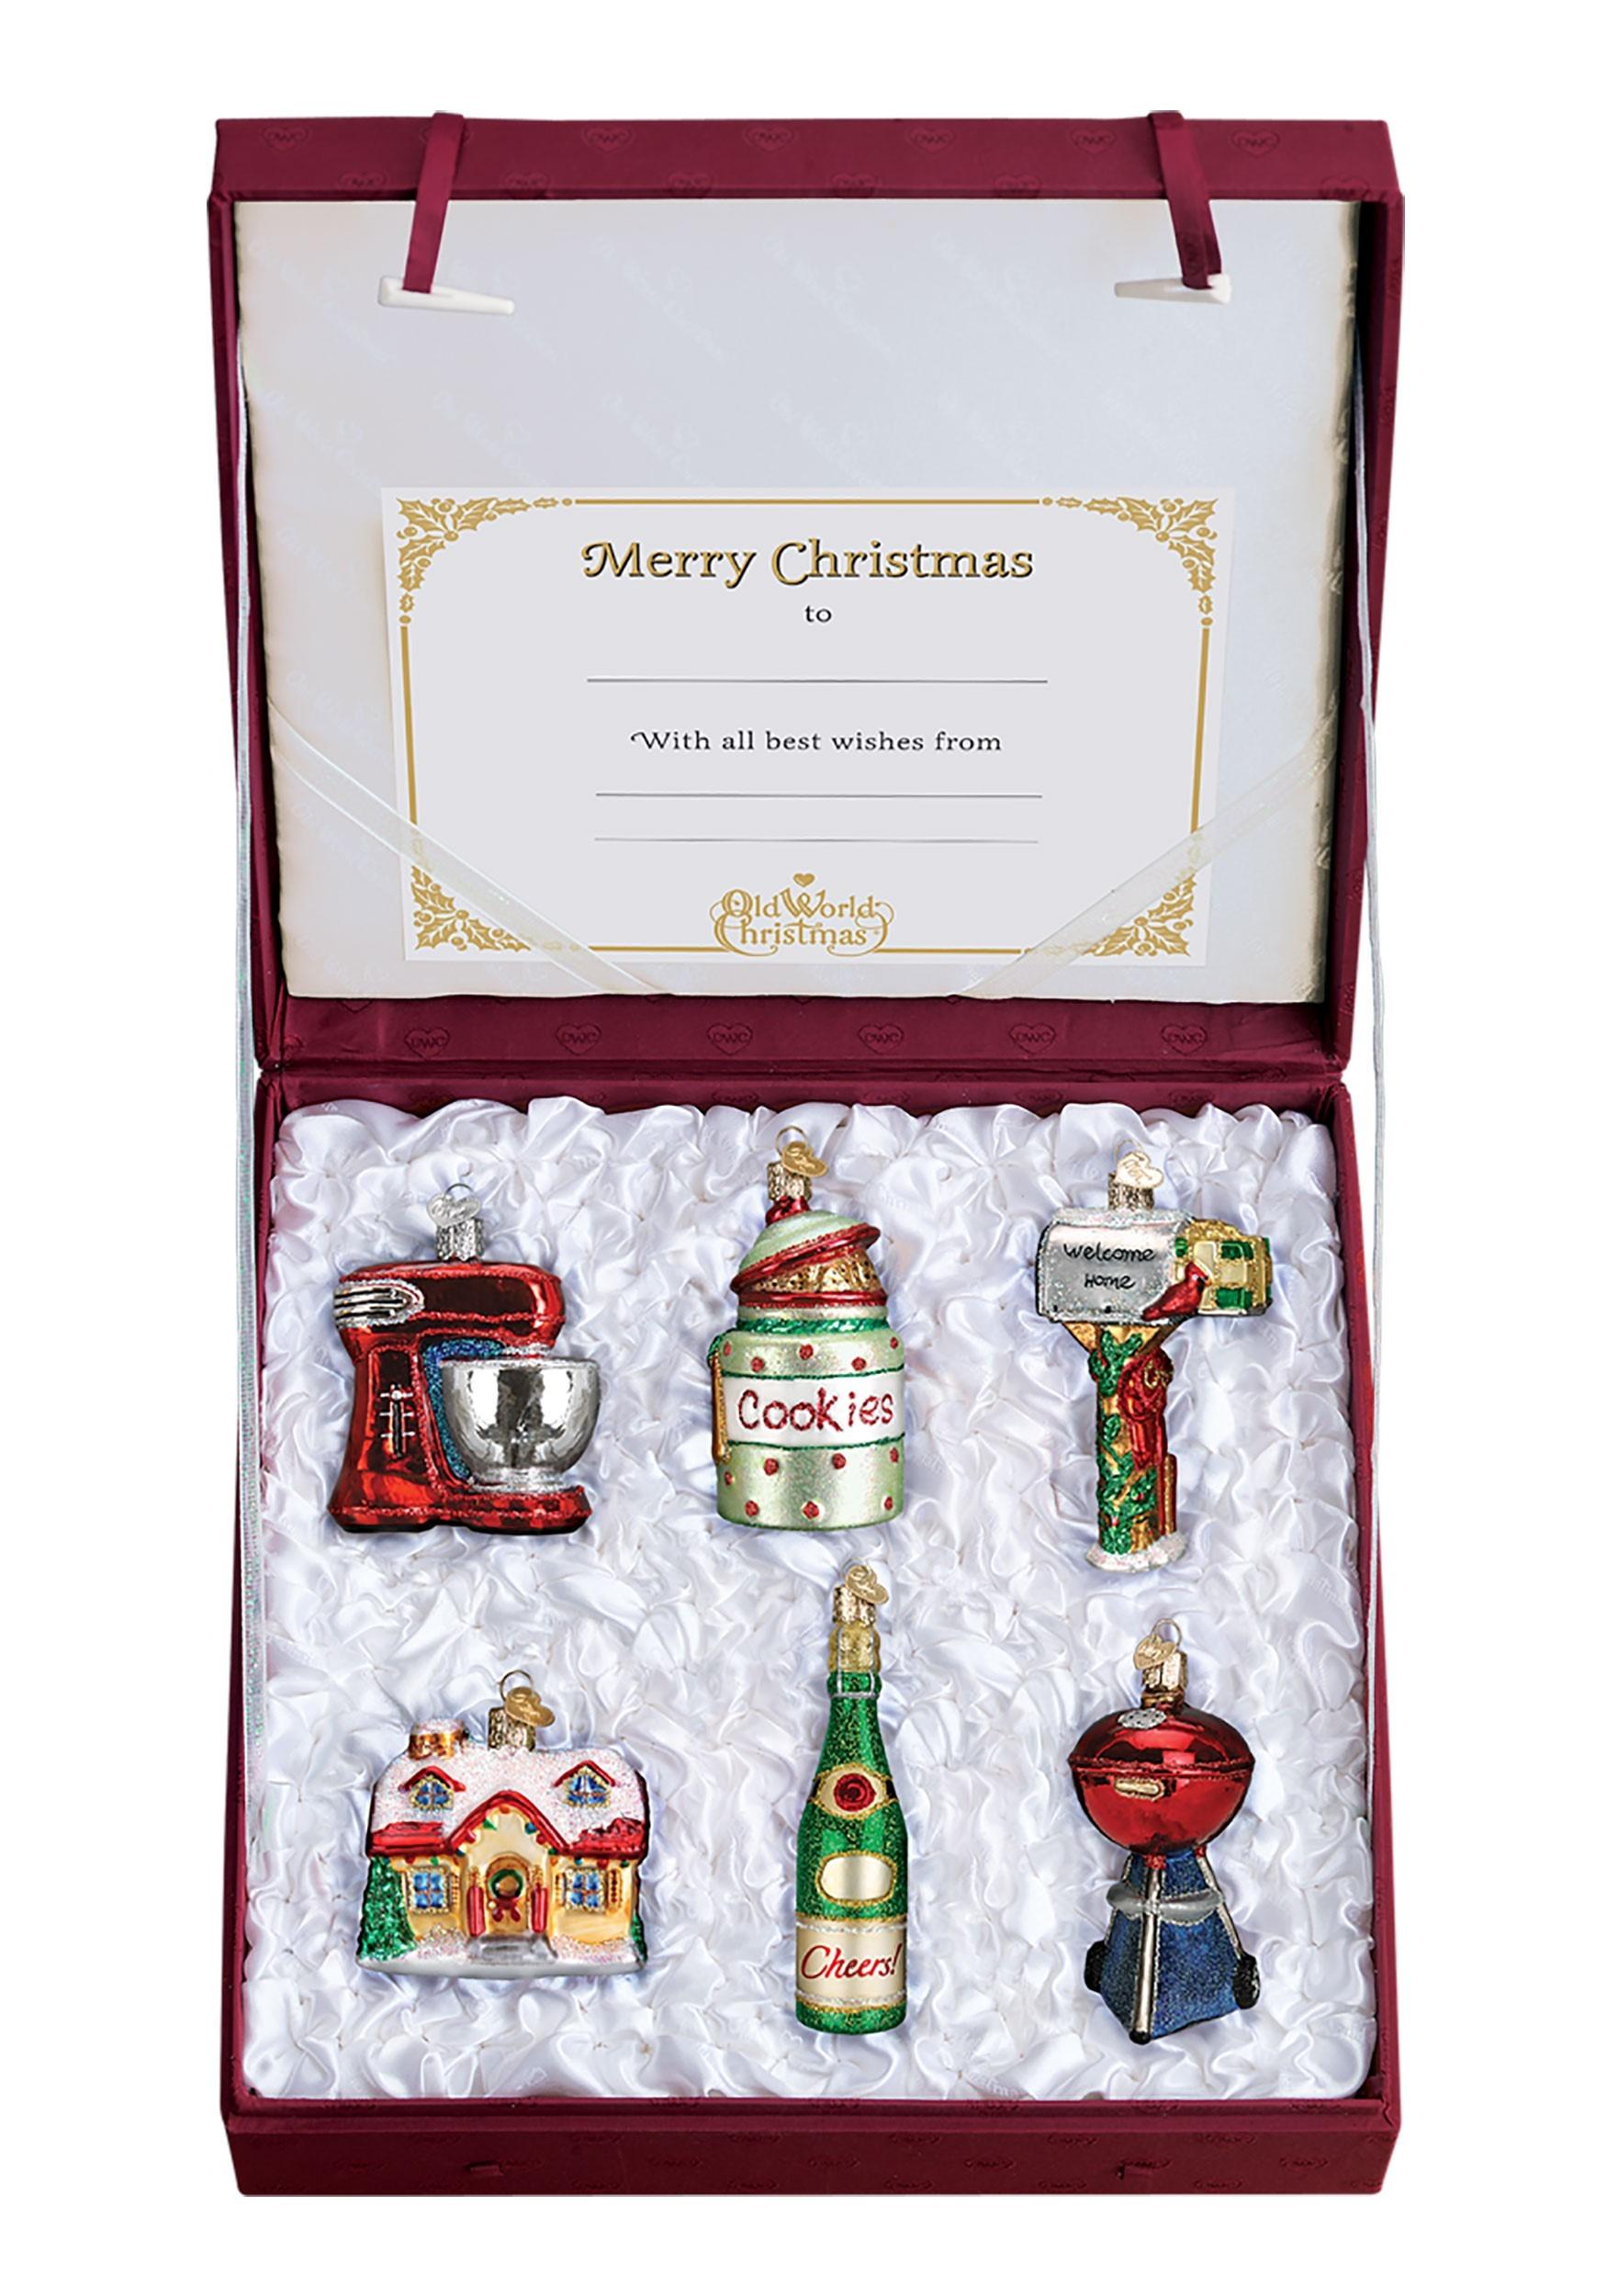 6-Piece_Housewarming_Ornament_Collection